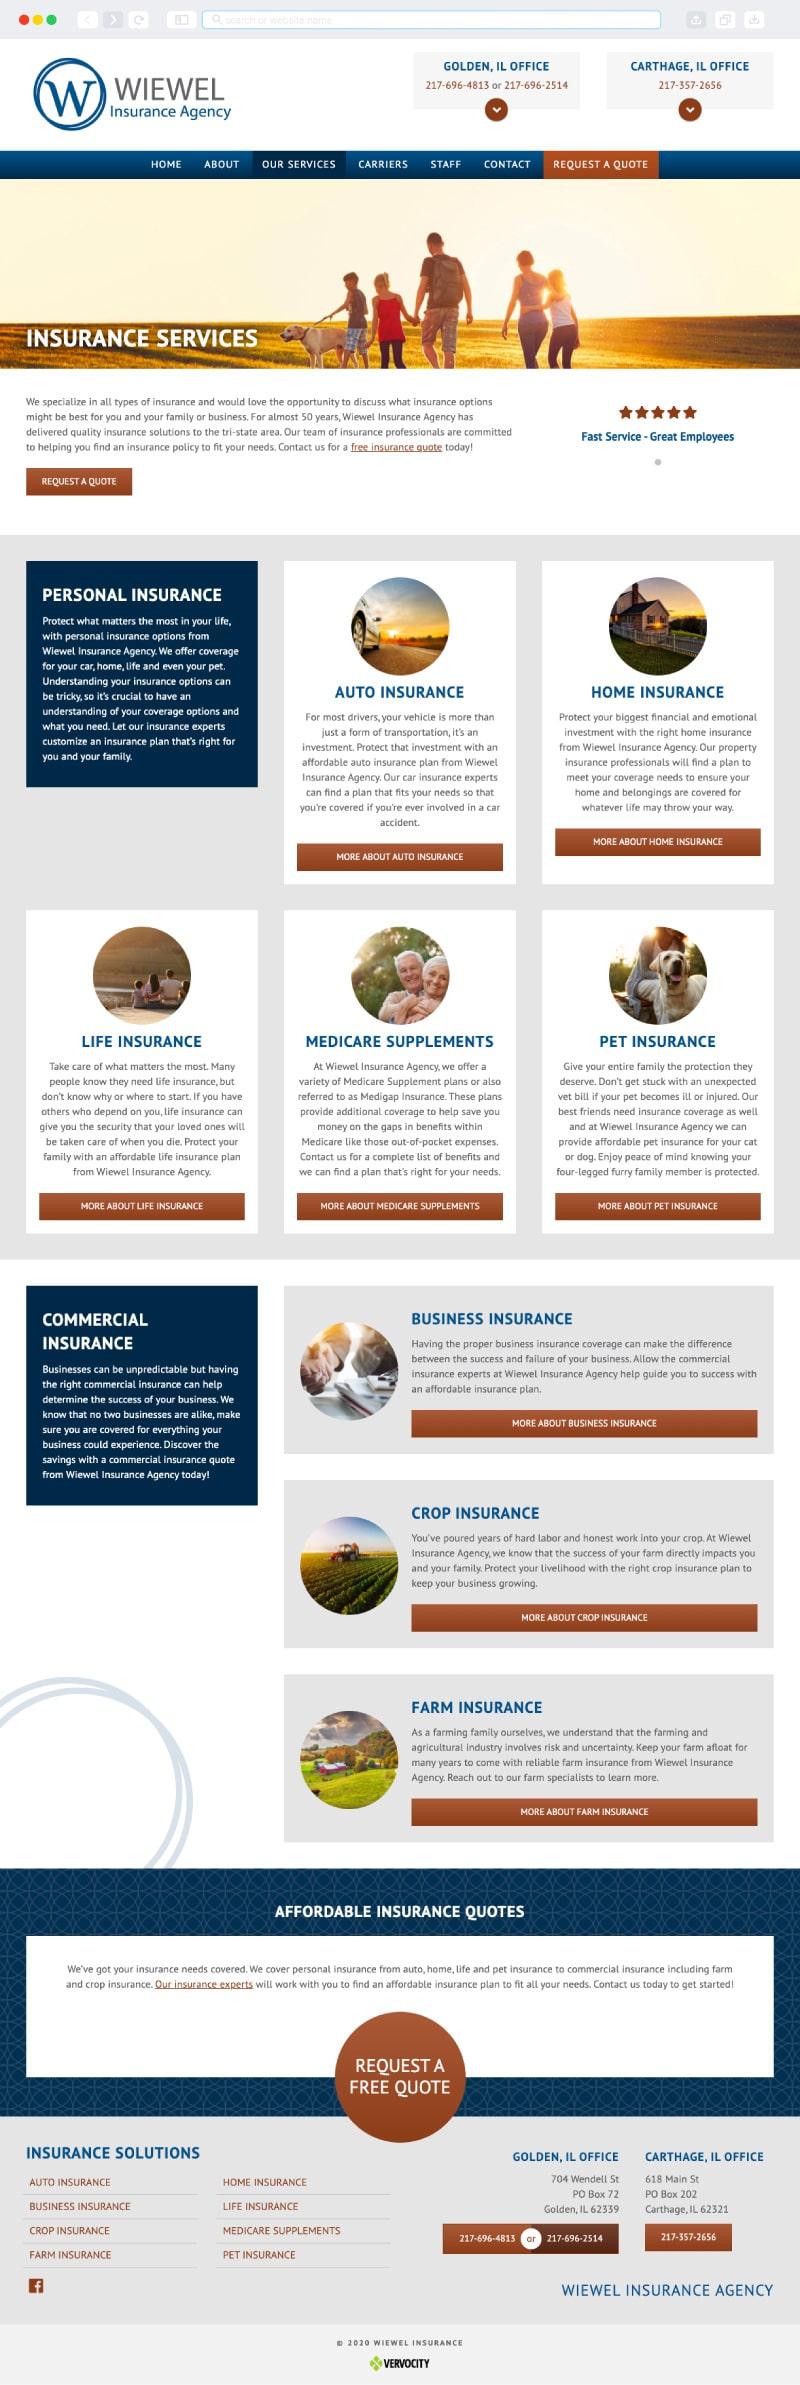 Wiewel Insurance Interior Page | Vervocity